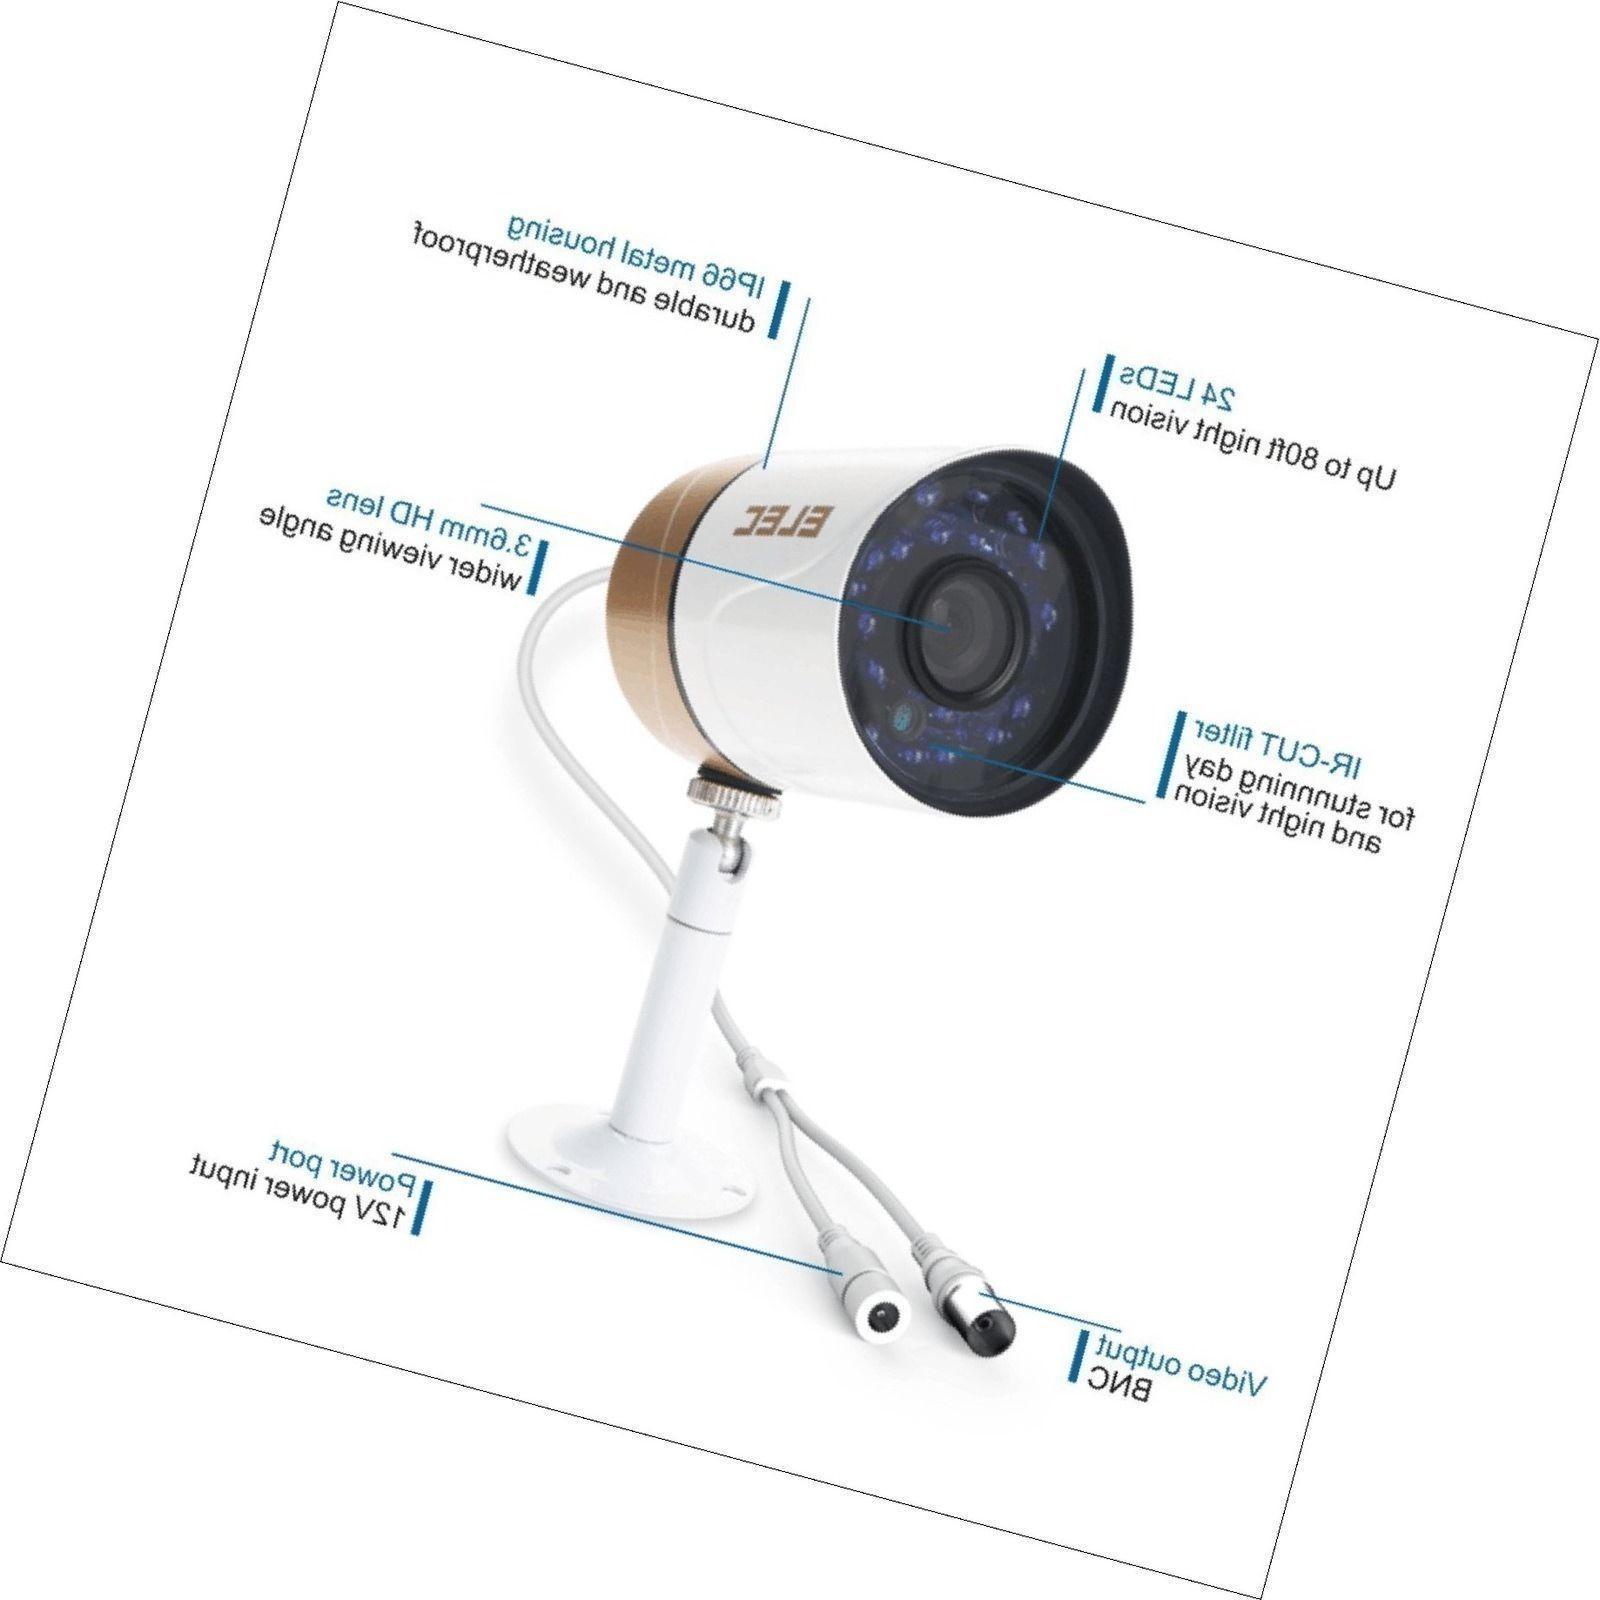 Security Camera 1/4 1080P Outdoor Indoor Home Surveillance New